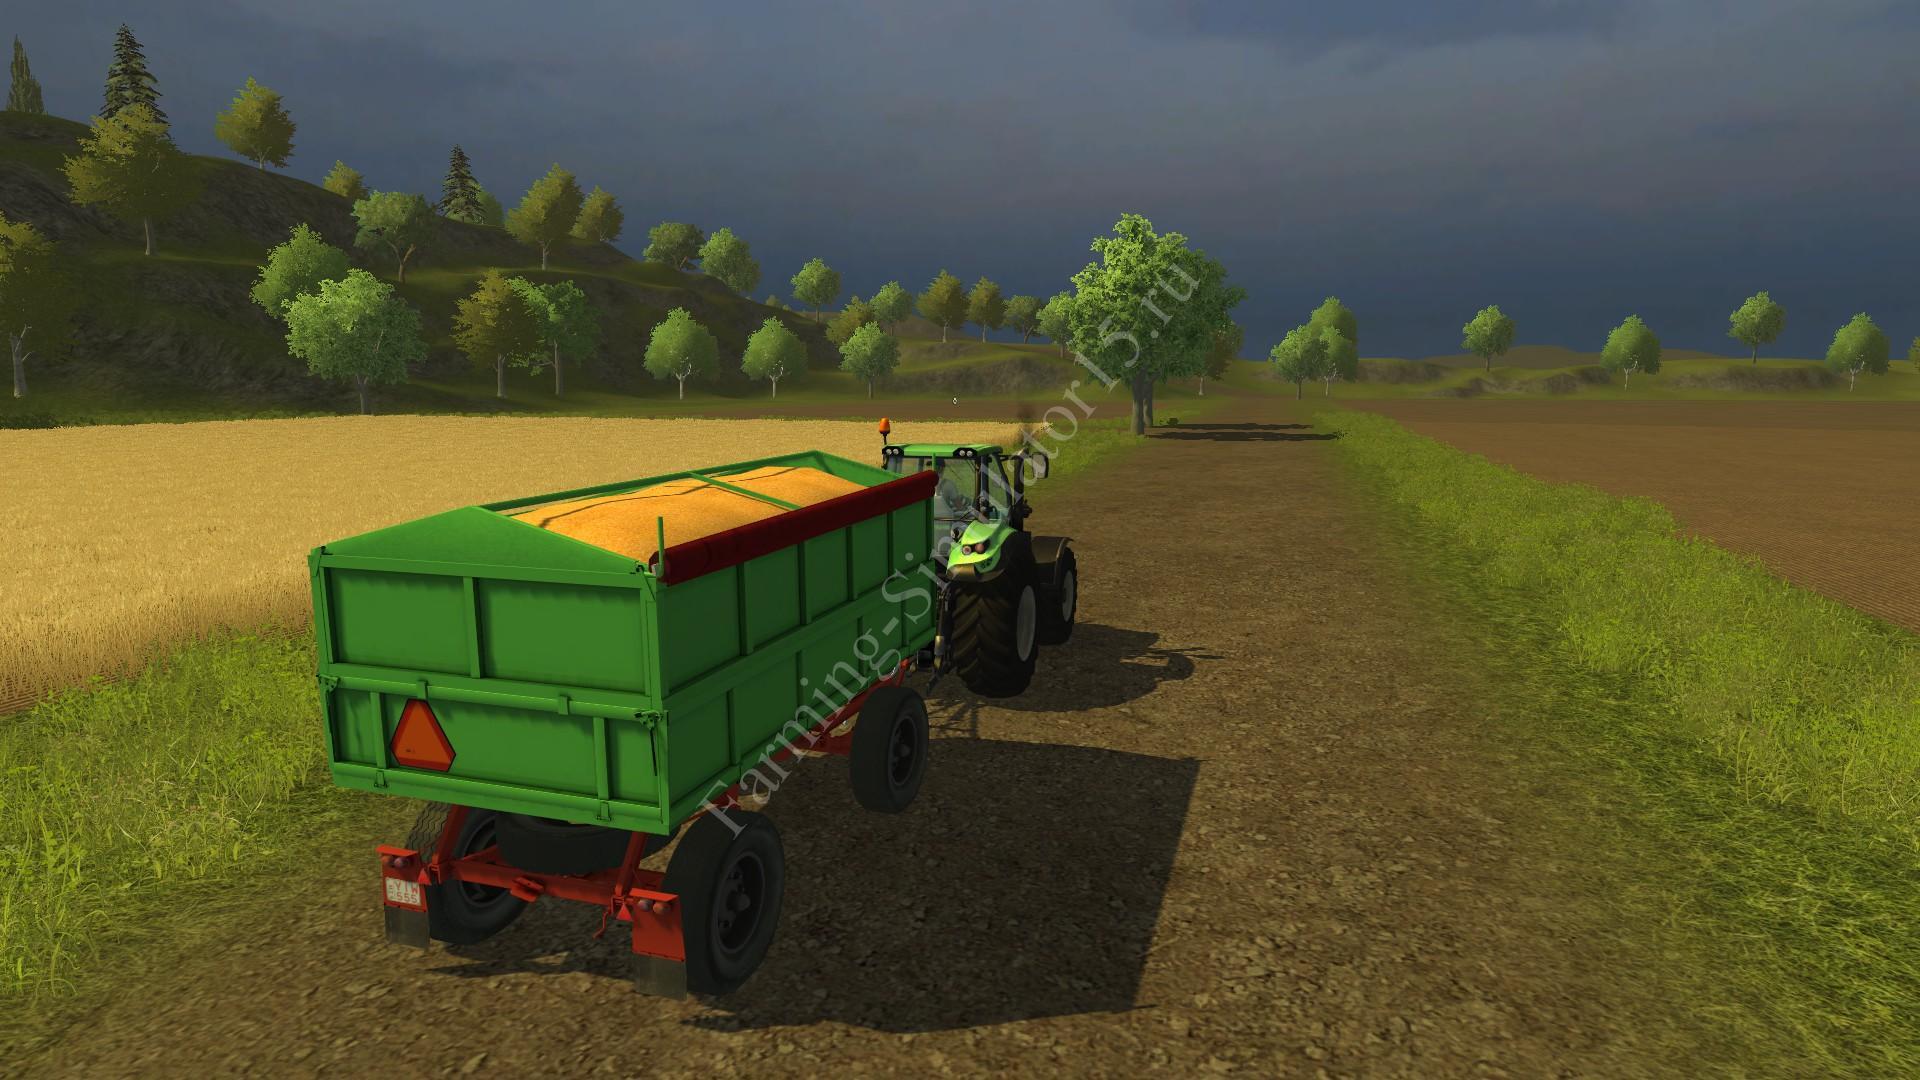 Мод прицепа IFA HK 5-1 v 1.0 More Realistic Farming Simulator 2013, Farming Simulator 13